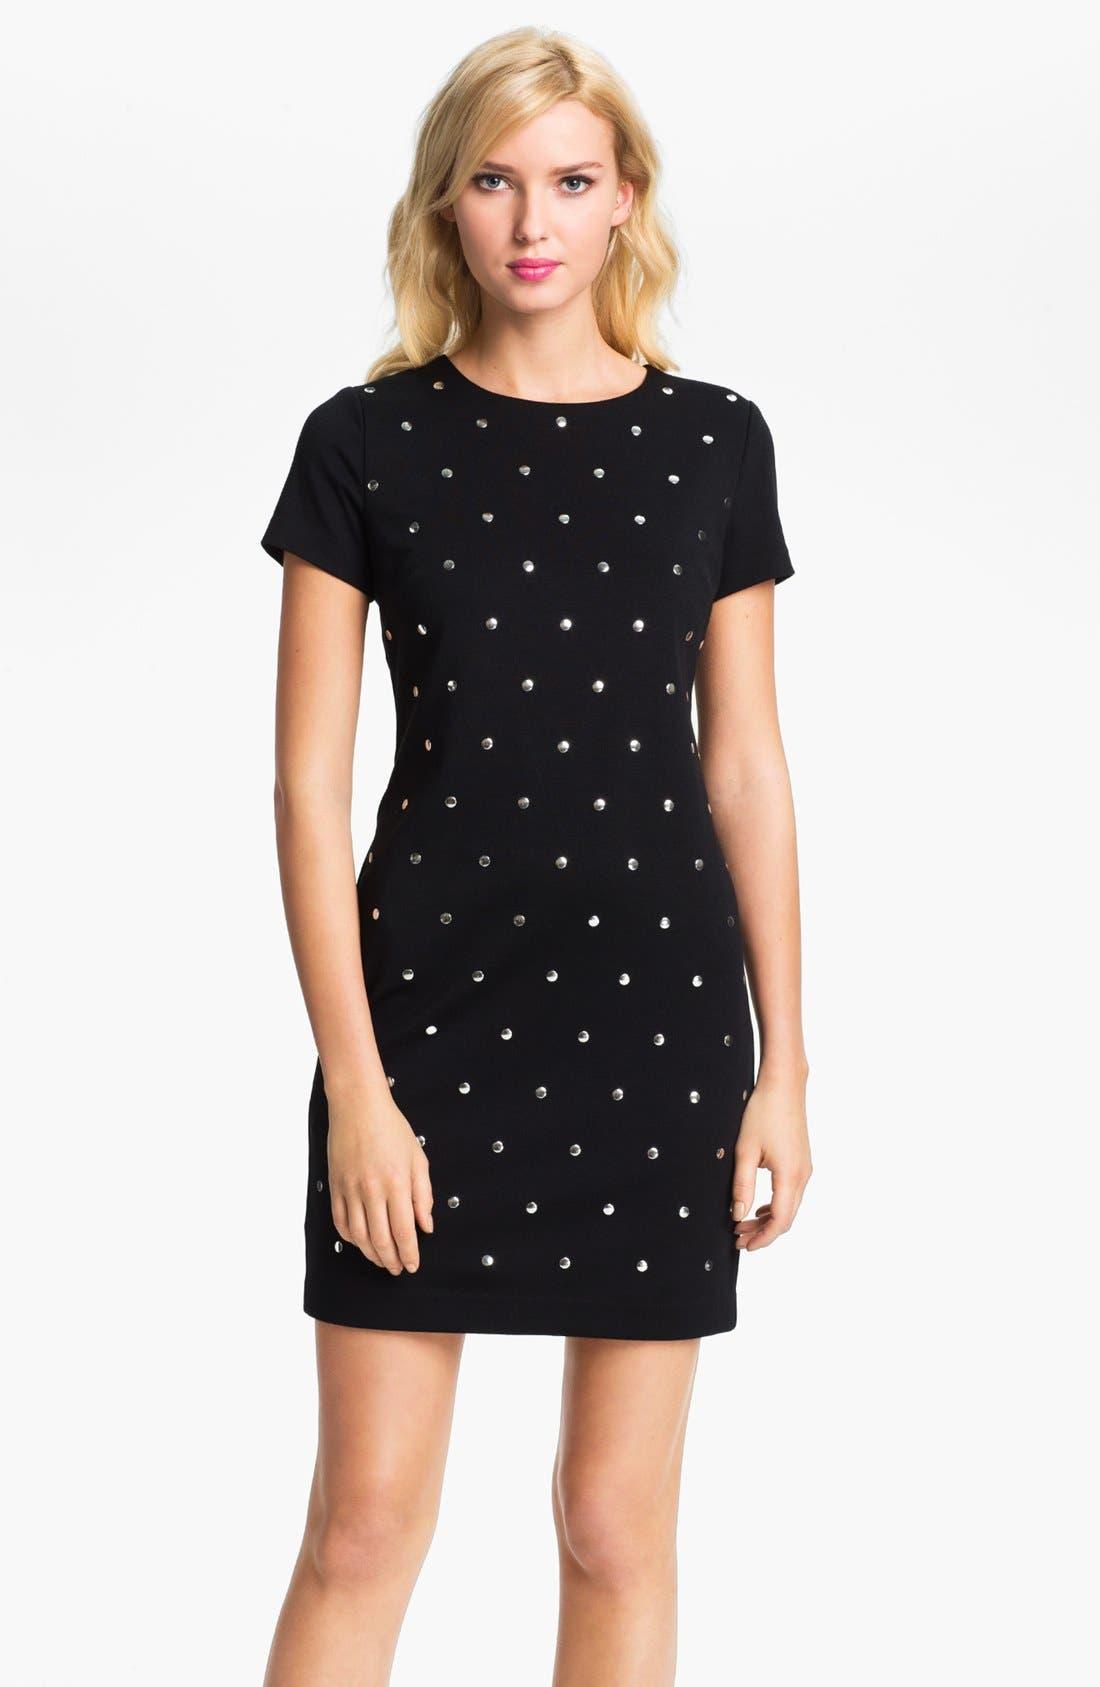 Alternate Image 1 Selected - MICHAEL Michael Kors Studded Short Sleeve Dress (Petite)